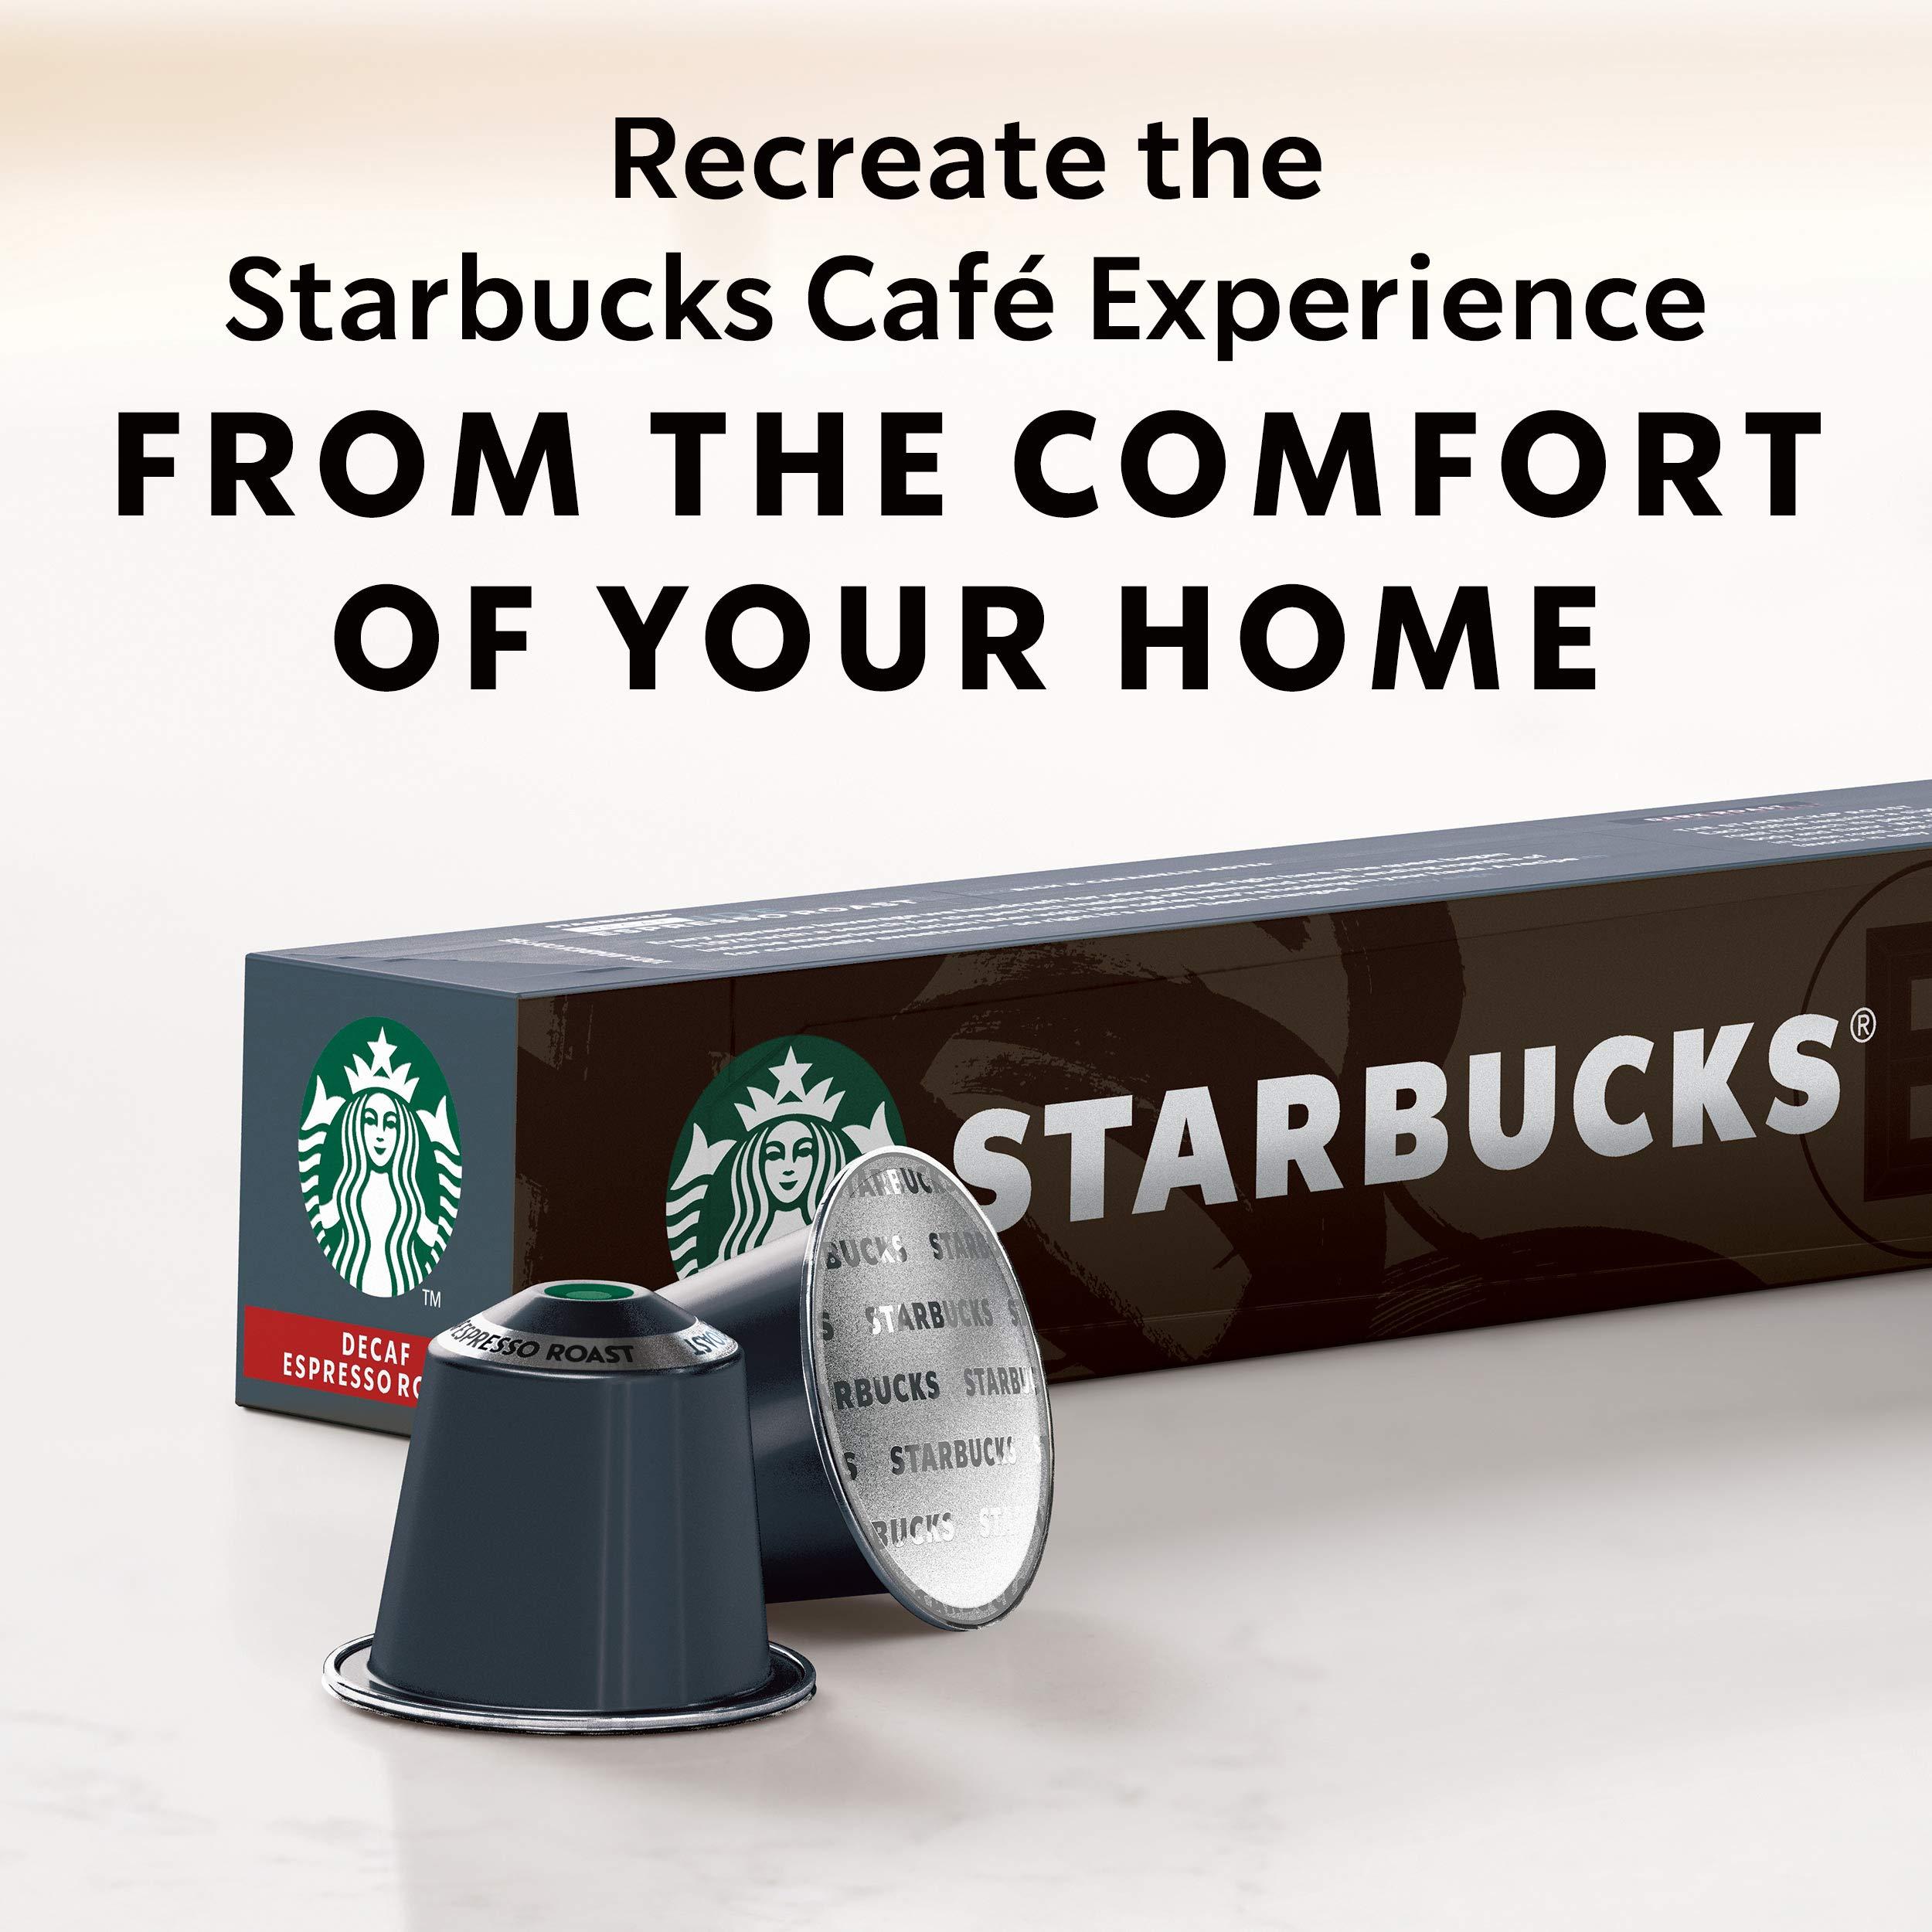 Starbucks by Nespresso, Decaf Espresso Dark Roast (50-count single serve capsules, compatible with Nespresso Original Line System) by Starbucks for Nespresso (Image #6)